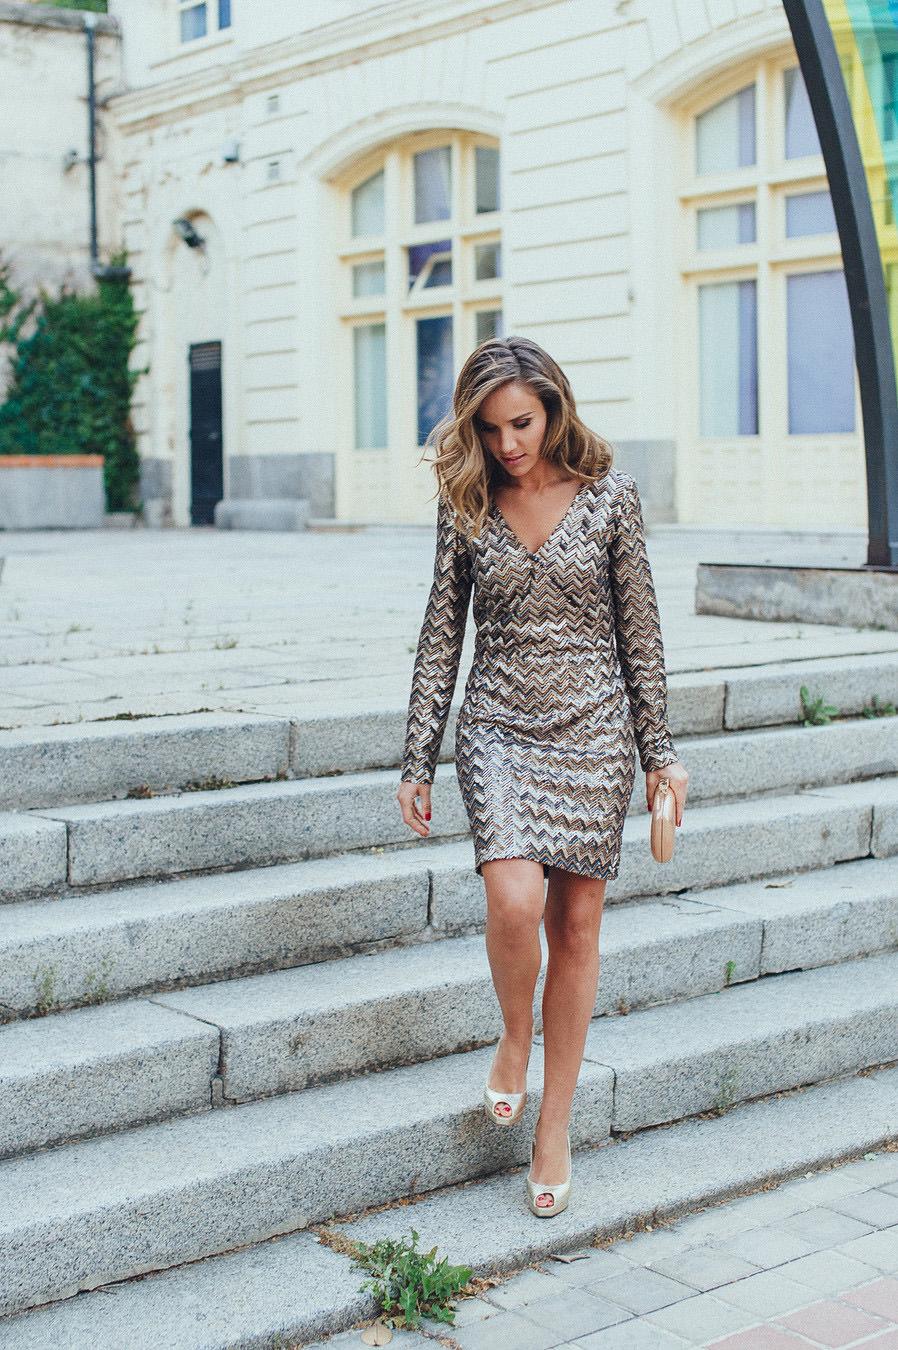 calista-one-lista-de-bodas-online-blog-de-bodas-bossanova-looks-invitadas-jeremy-sanders-5